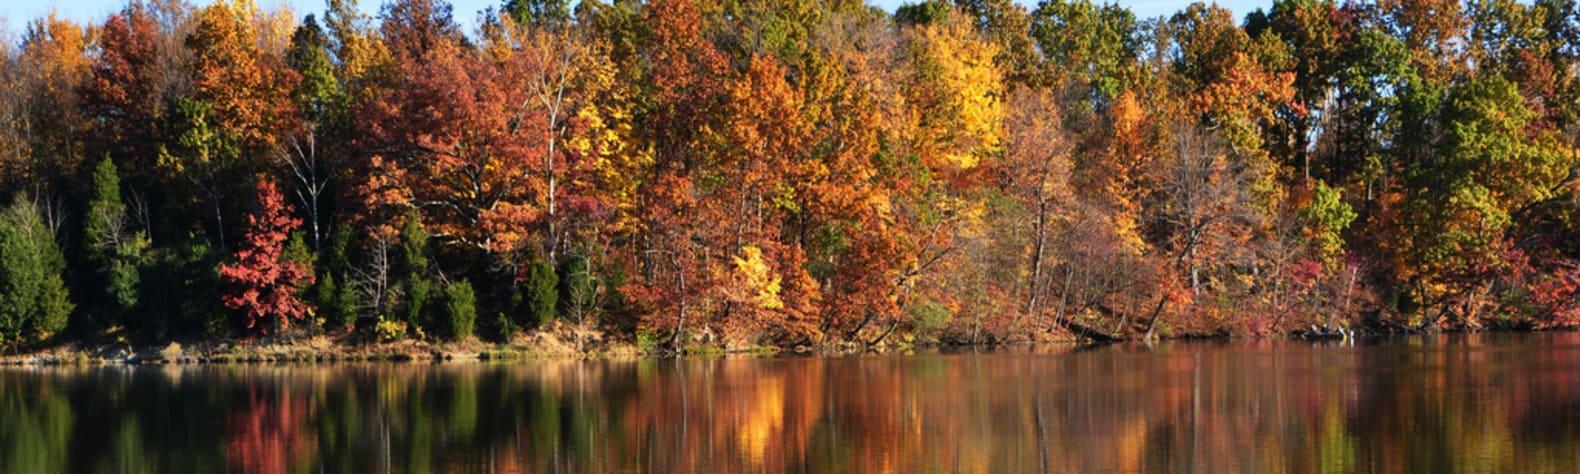 Cowan Lake State Park